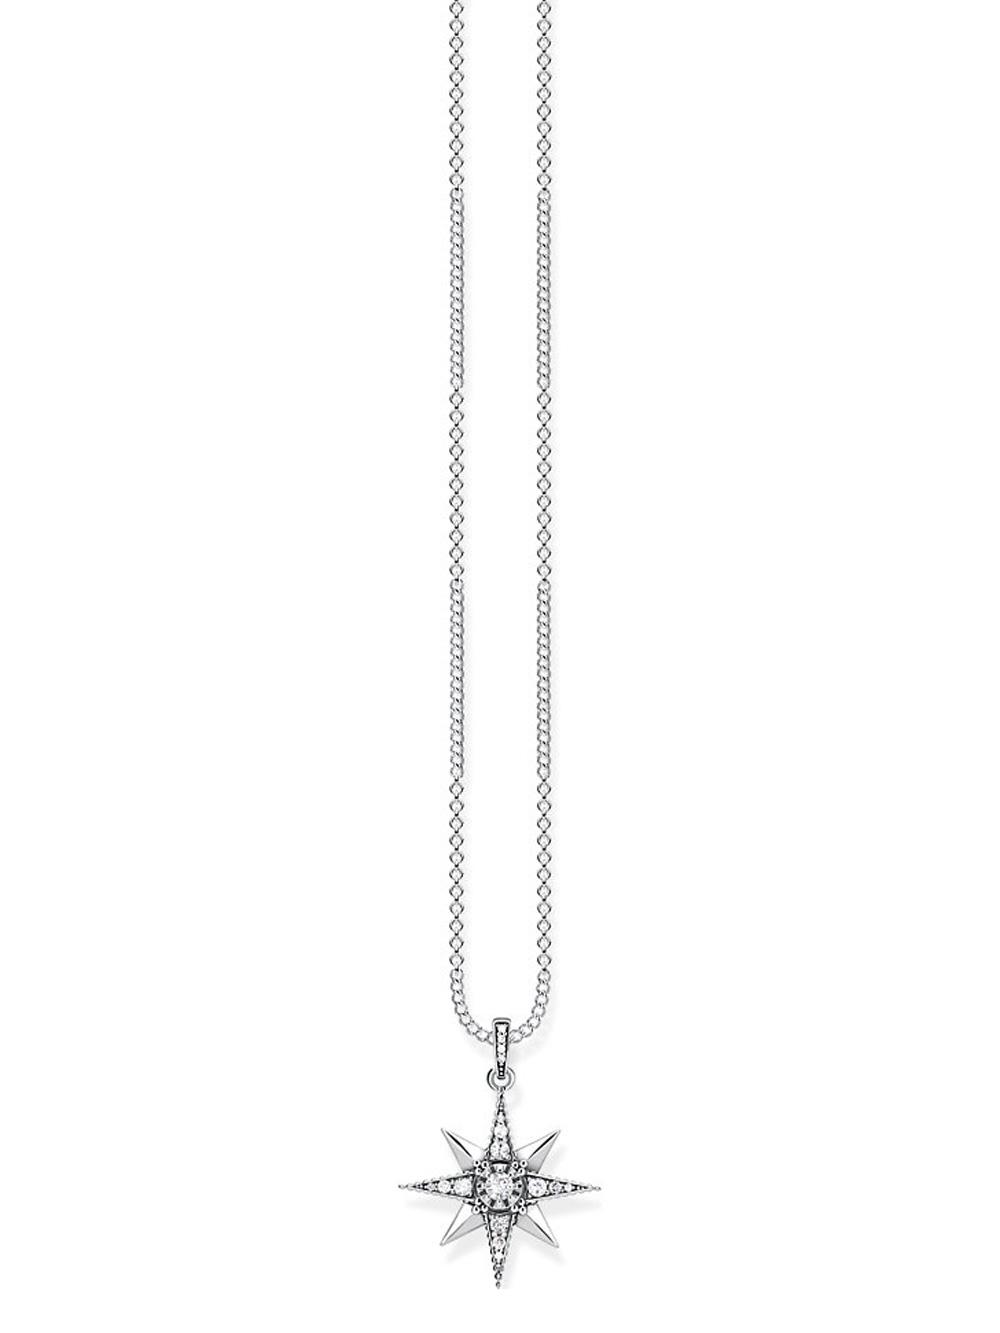 Thomas Sabo Halskette KE1825-643-14-L45v 40-45cm m. Anhänger Royalty Stern